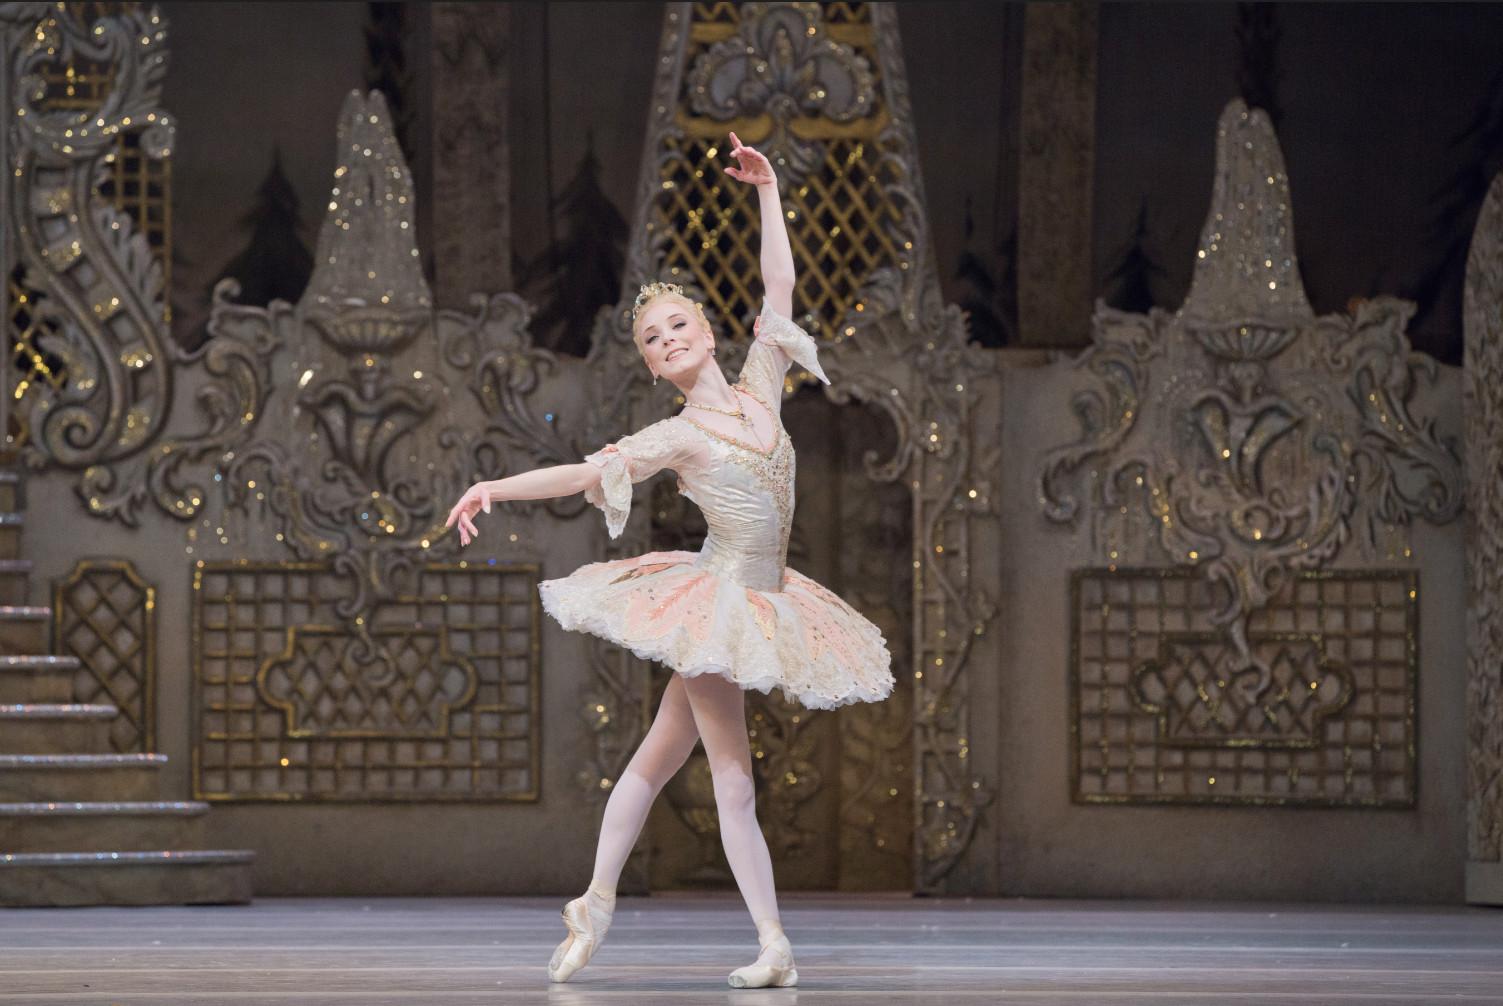 Sarah lamb as the sugar plum fairy in the nutcracker, the royal ballet. (c) 2017 roh. photographed by karolina kuras.